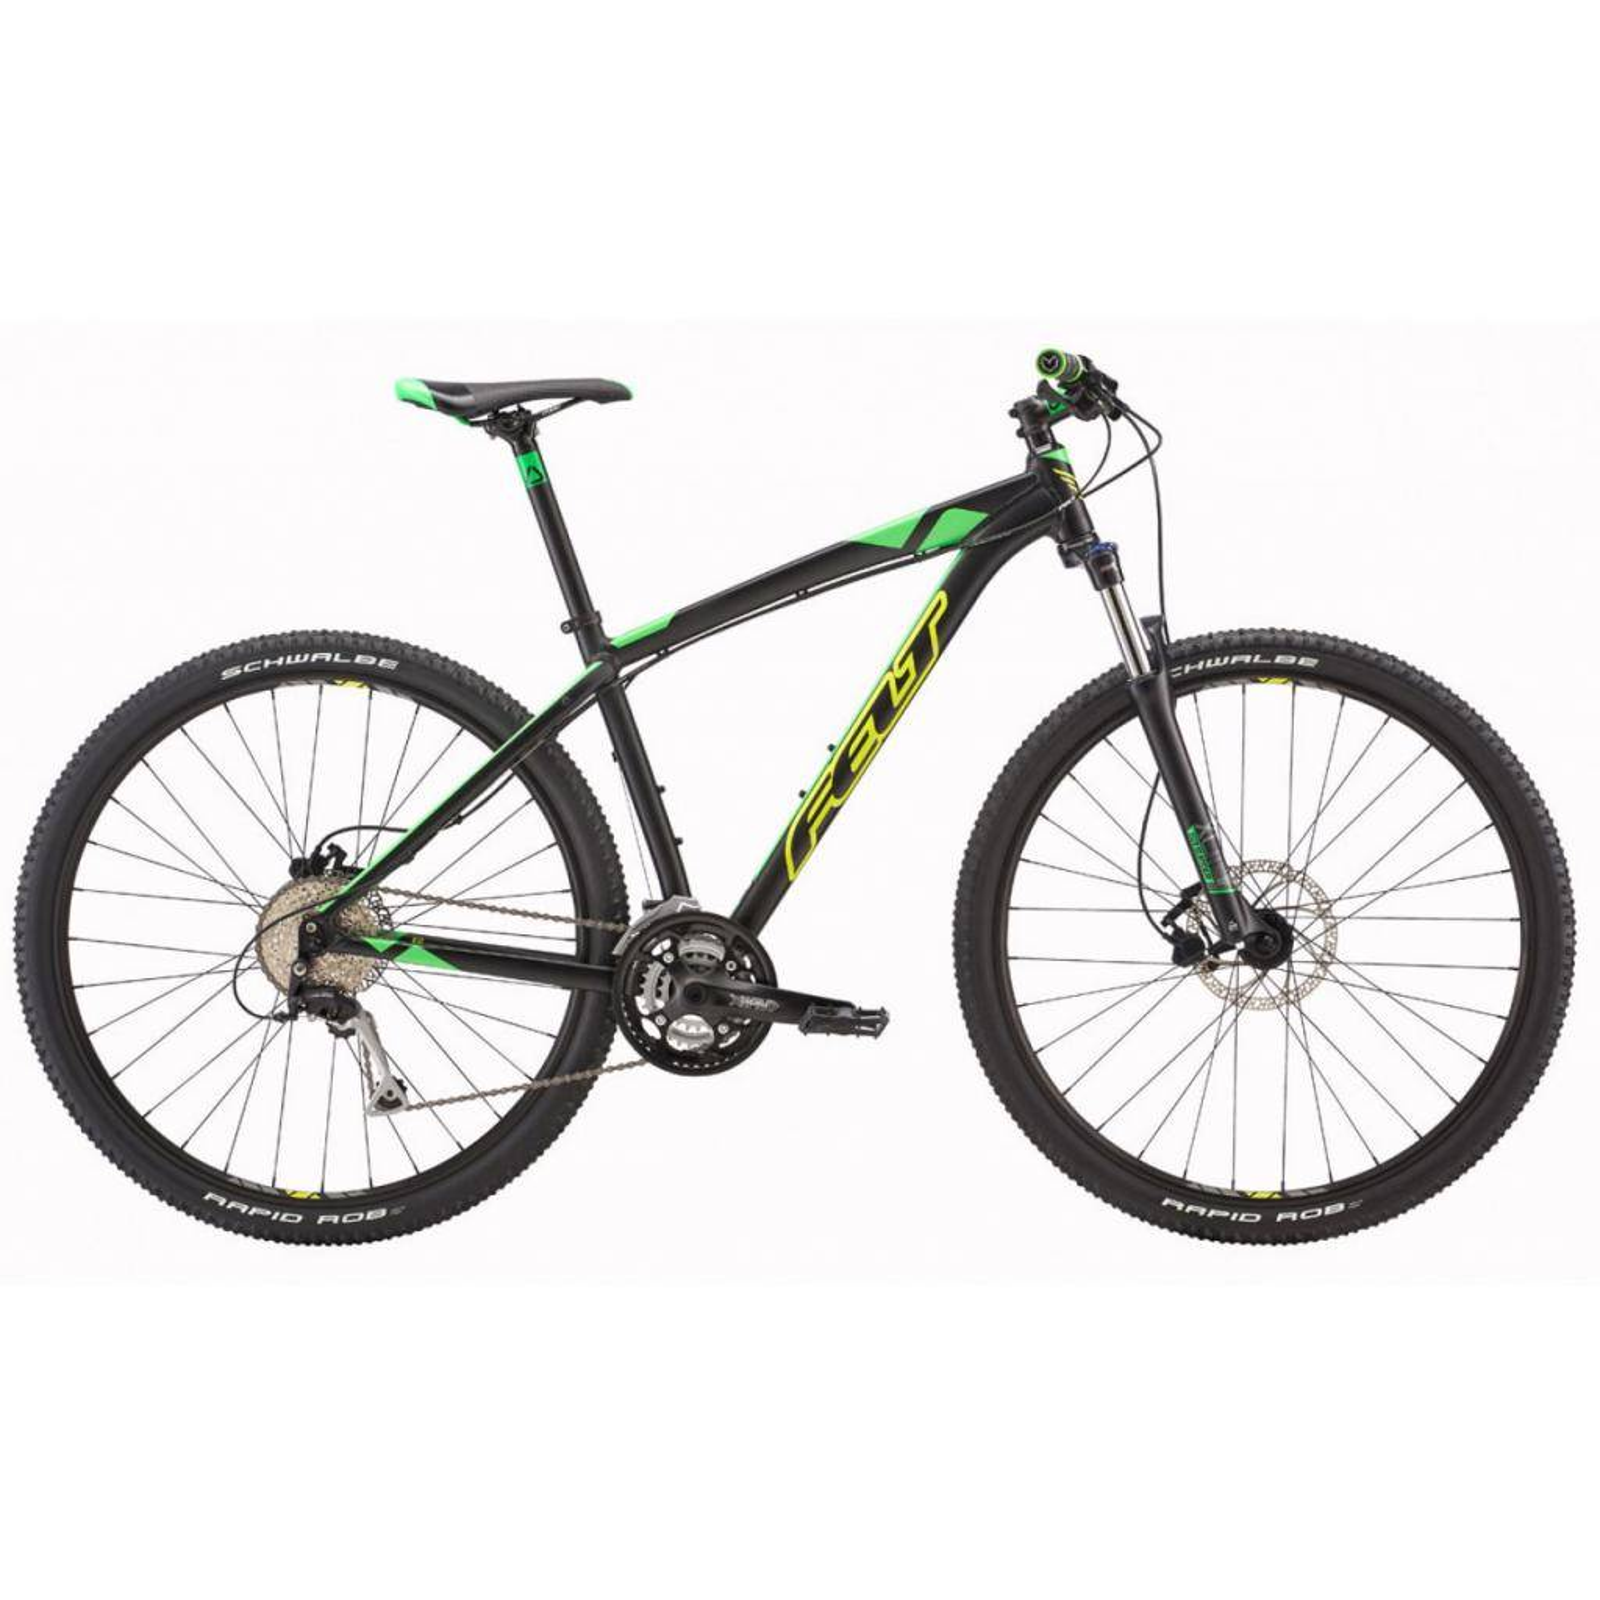 "Велосипед Felt 2016 MTB NINE 70 M matte black 18"" 52cm (8064 66501)"